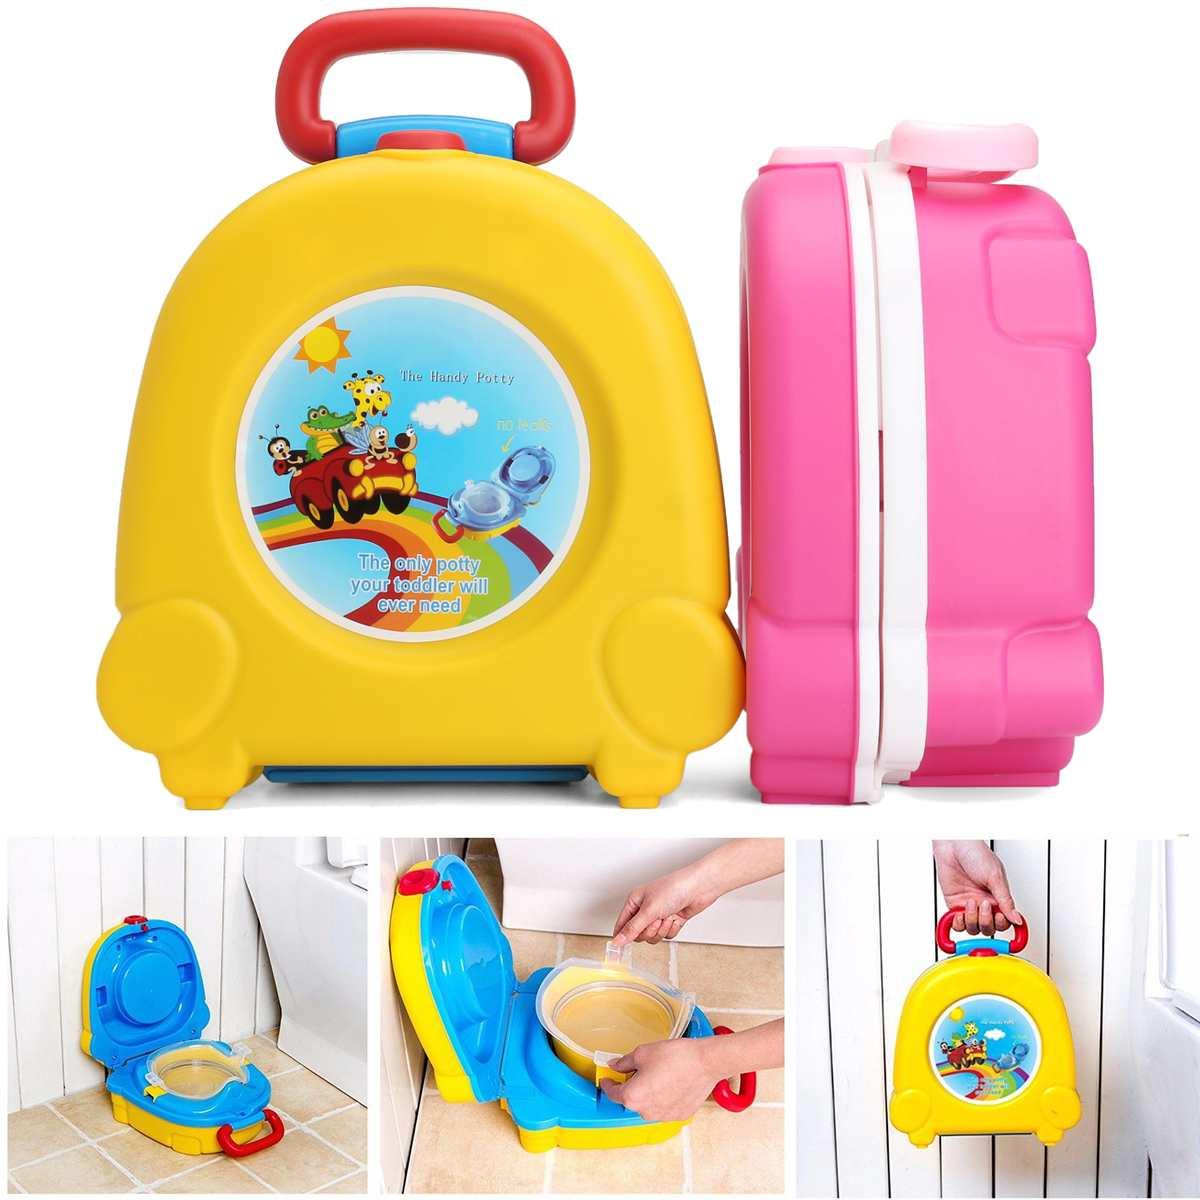 Portable Car Baby Potty Toilet Seat Bowl Training Pan Kids Pot Bedpan Comfortable Backrest Toilet Girls Boys Cartoon Pots